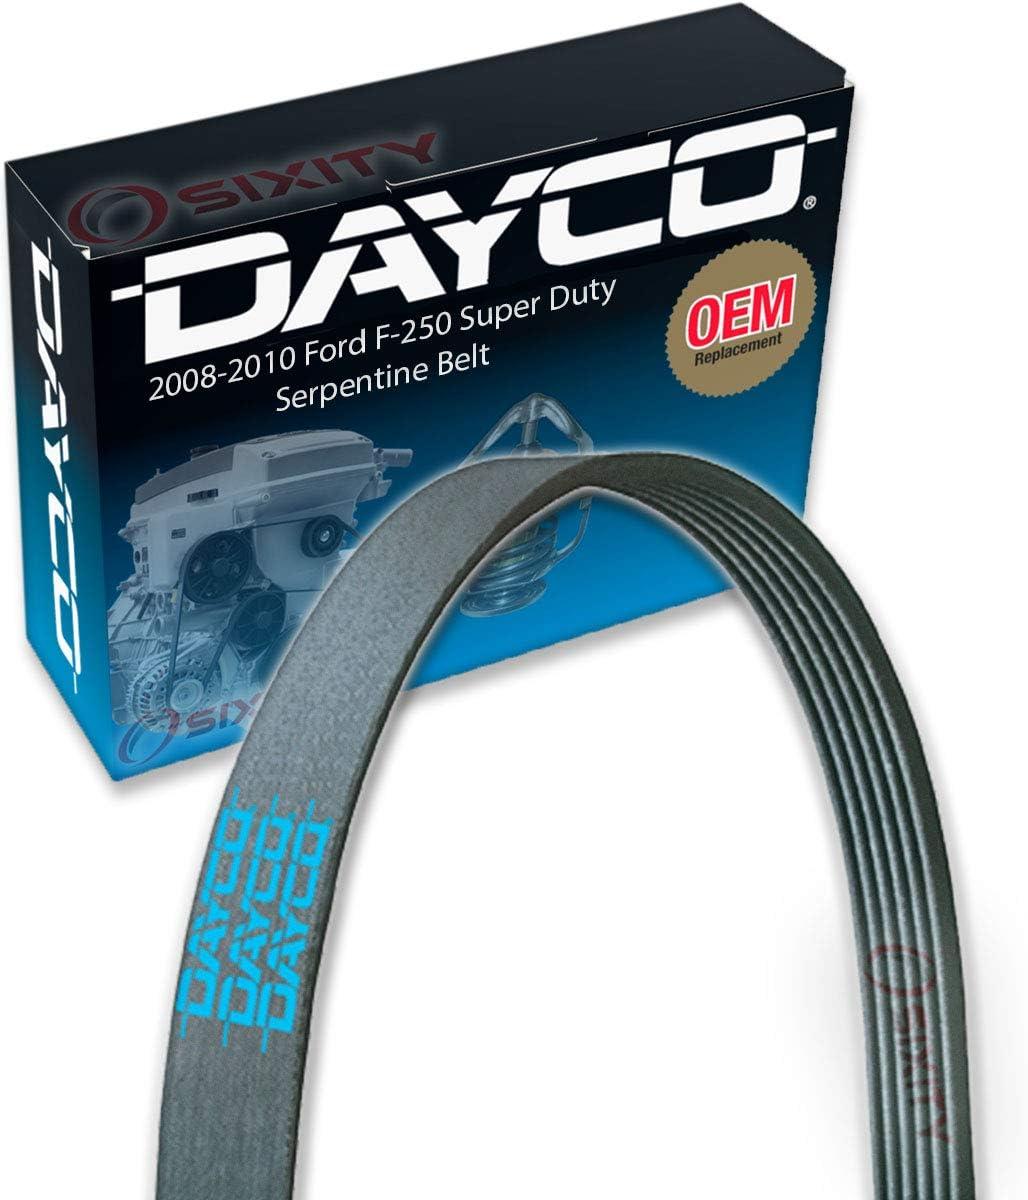 Dayco Main Drive Serpentine Belt for 2008-2010 Ford F-250 Super Duty 5.4L 6.8L V10 V8 Accessory Drive Belts Cooling System